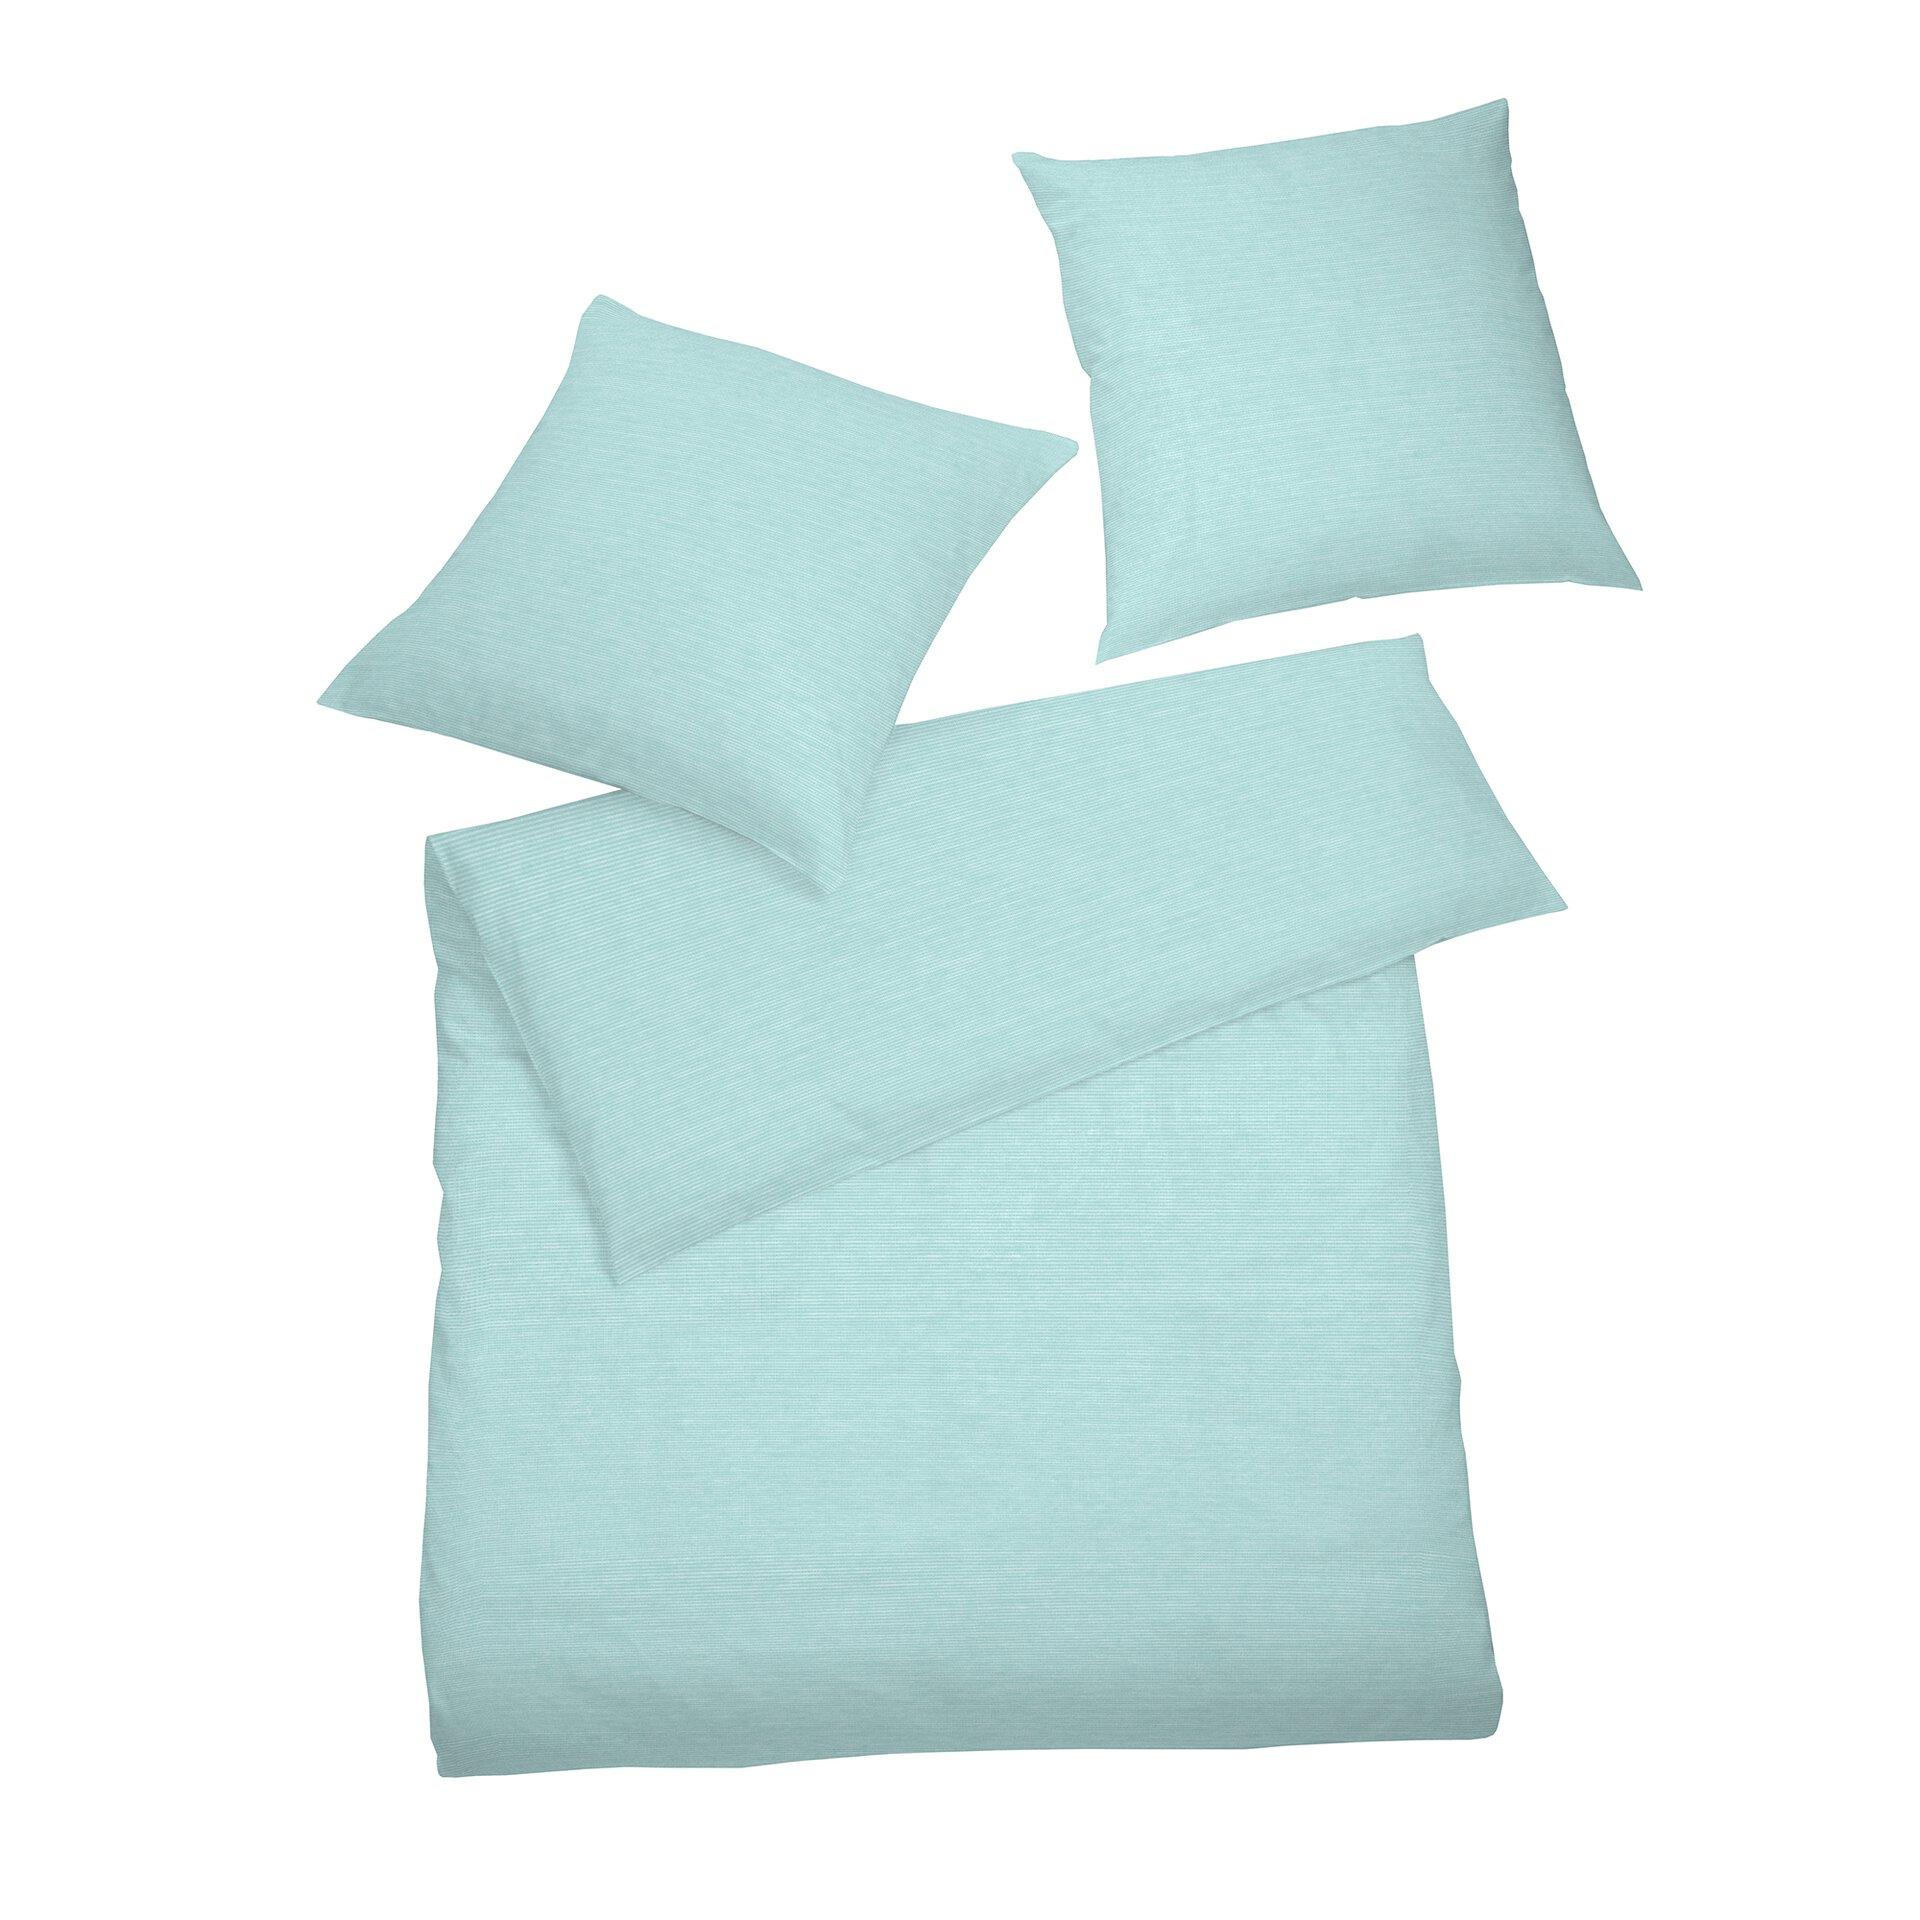 Satin-Bettwäsche Select Schlafgut Textil Blau 200 x 200 cm